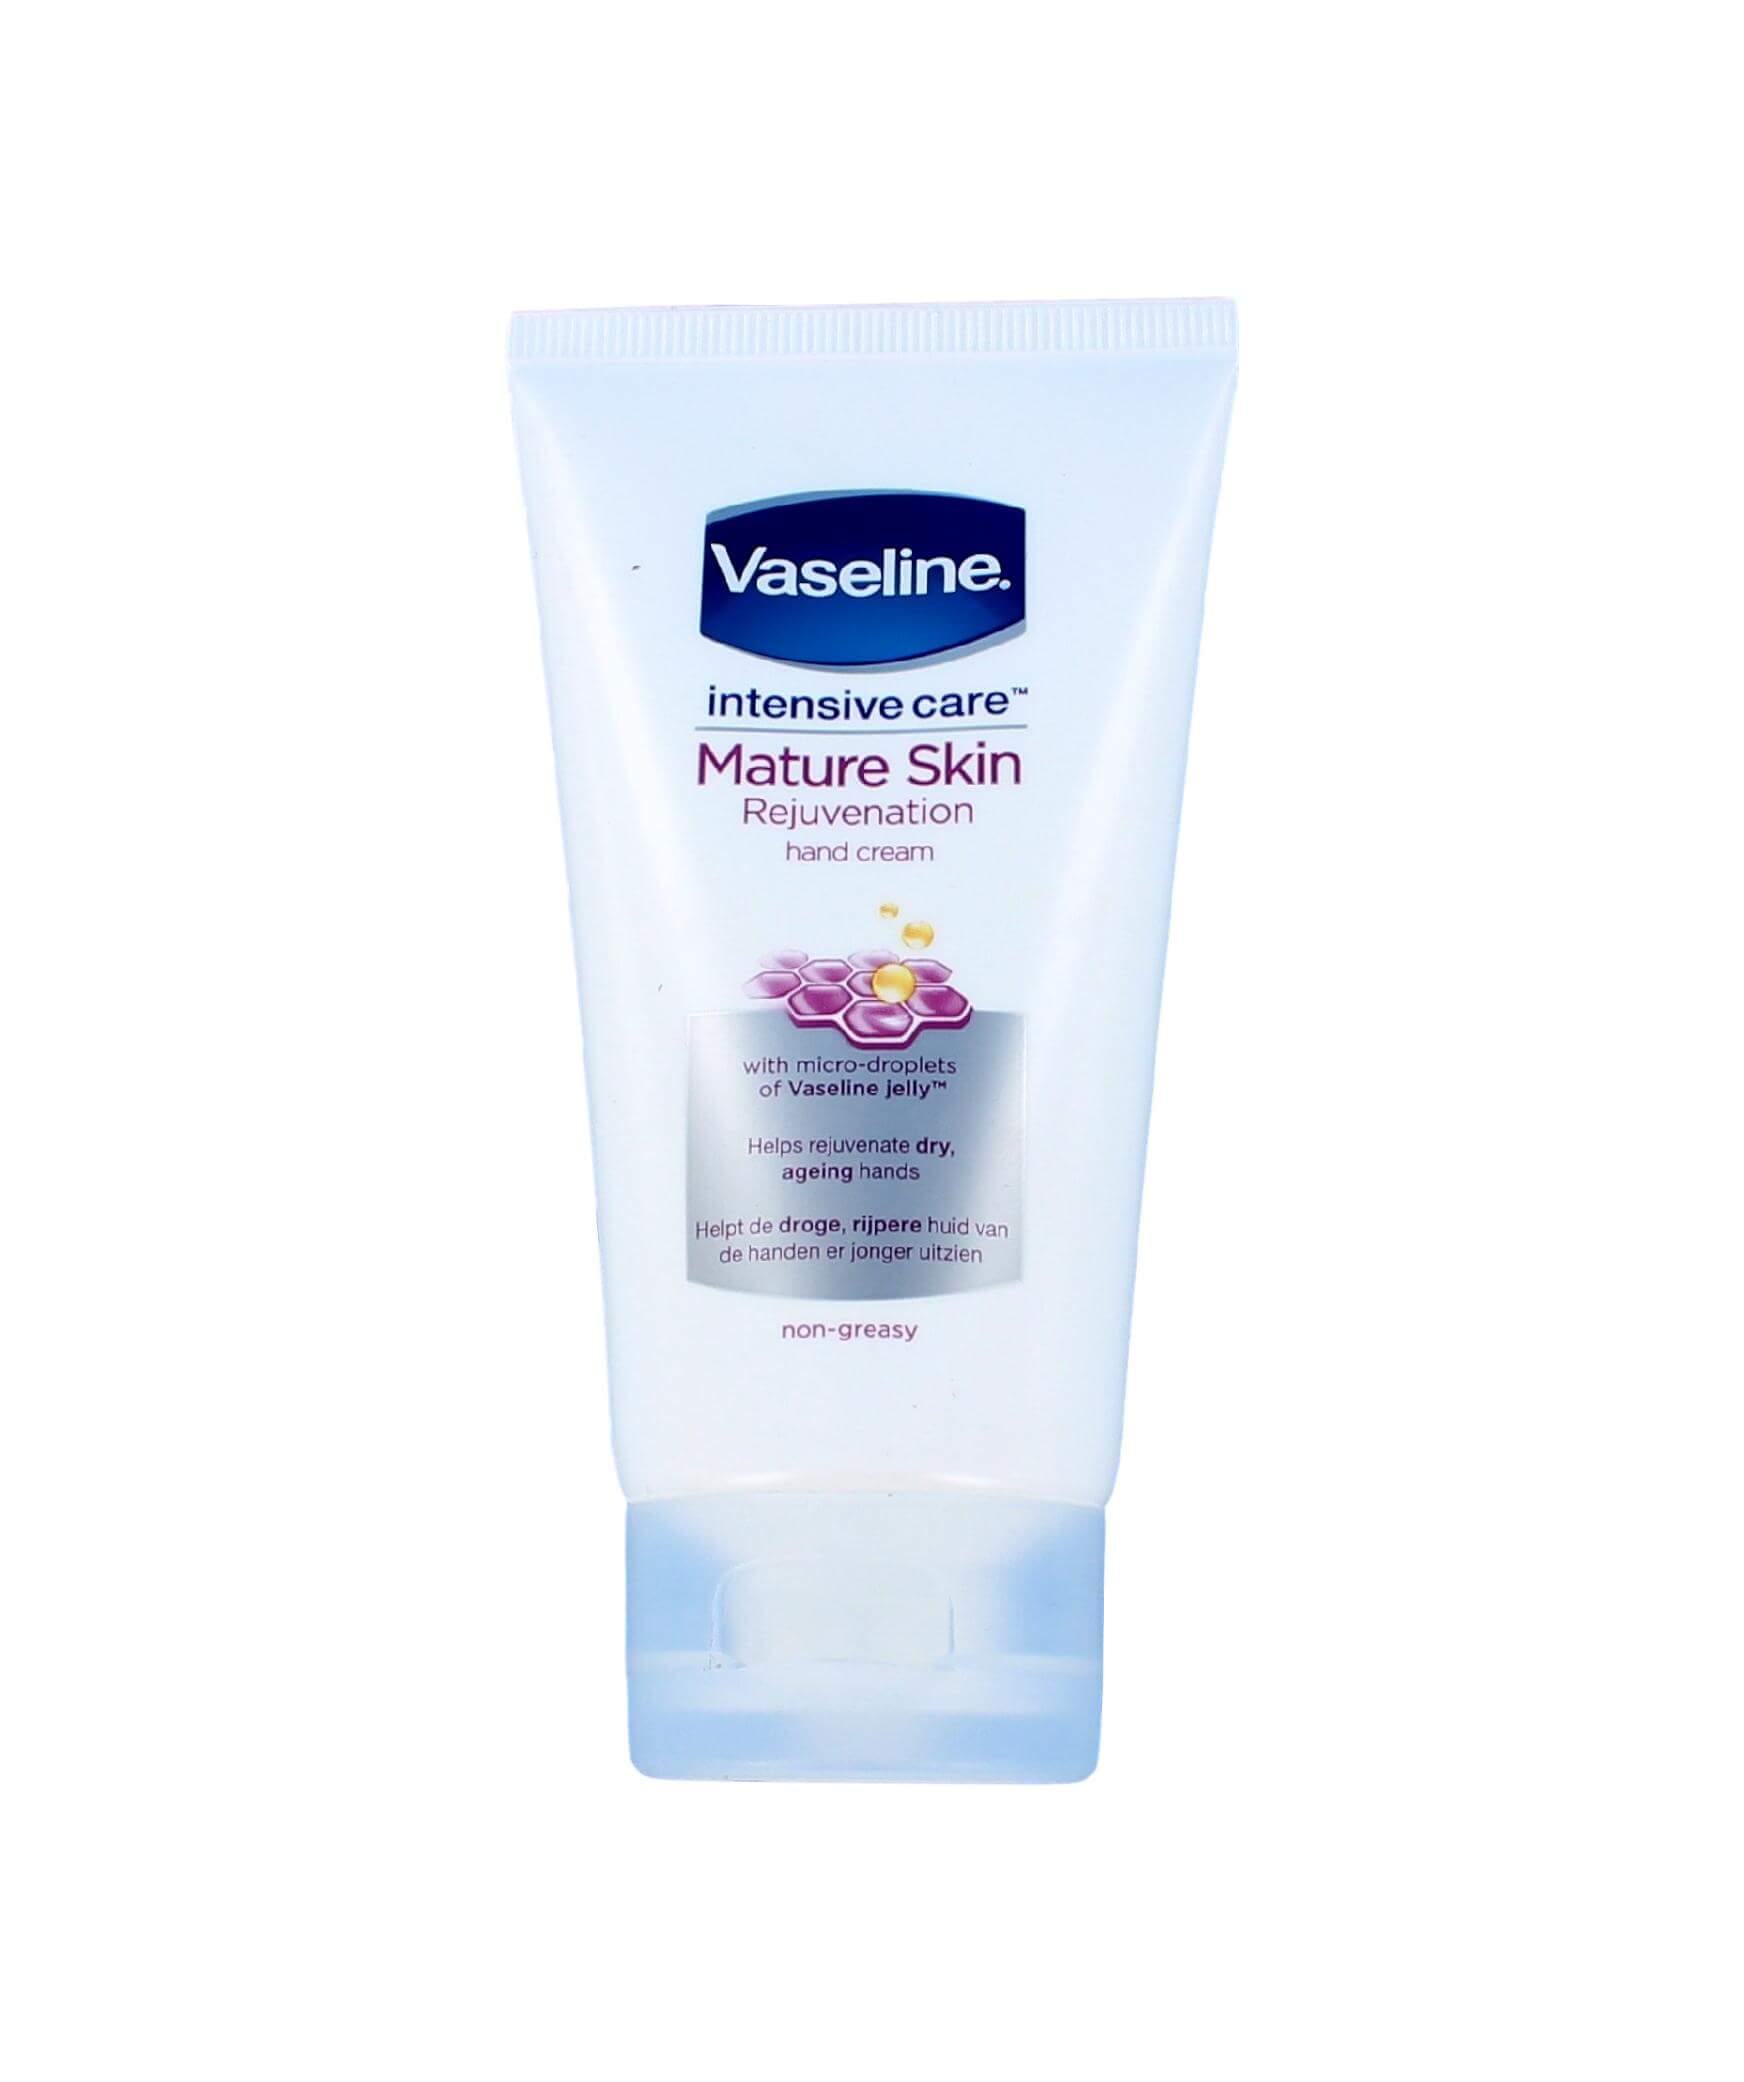 Vaseline Handcreme Intensive Care Mature Skin, 75 ml